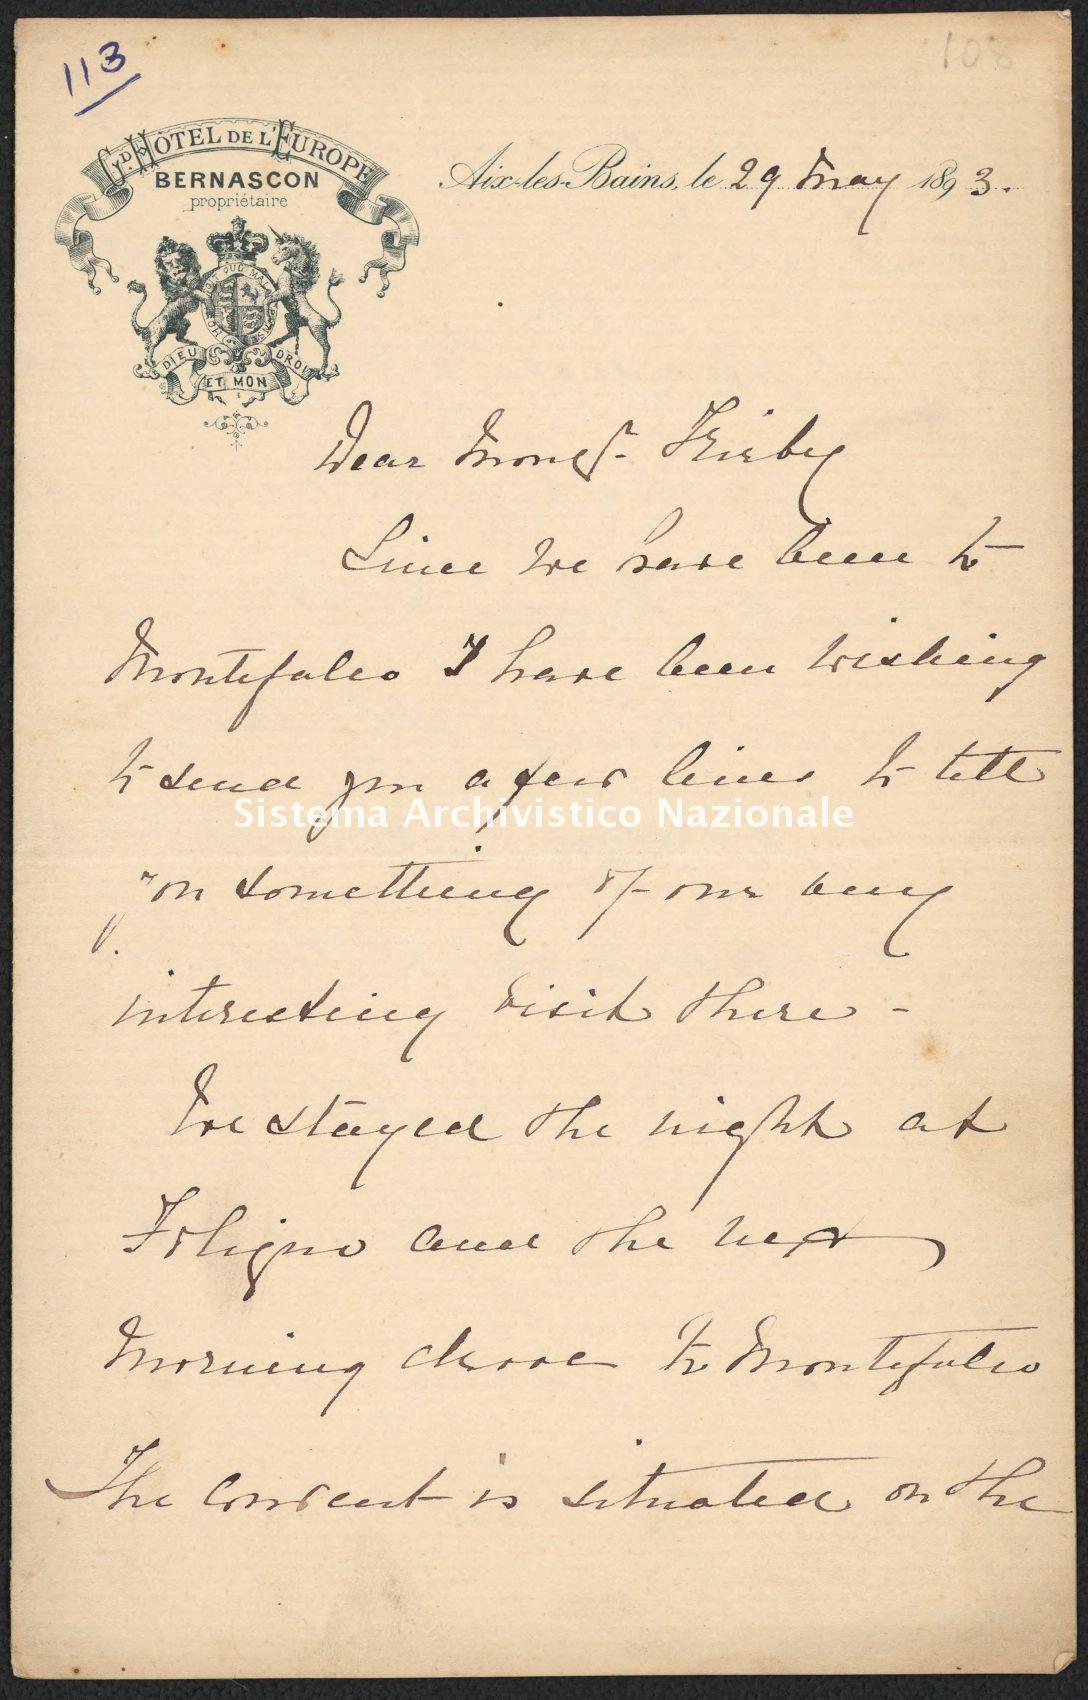 Pontificio Collegio Irlandese - Kirby_1893_113